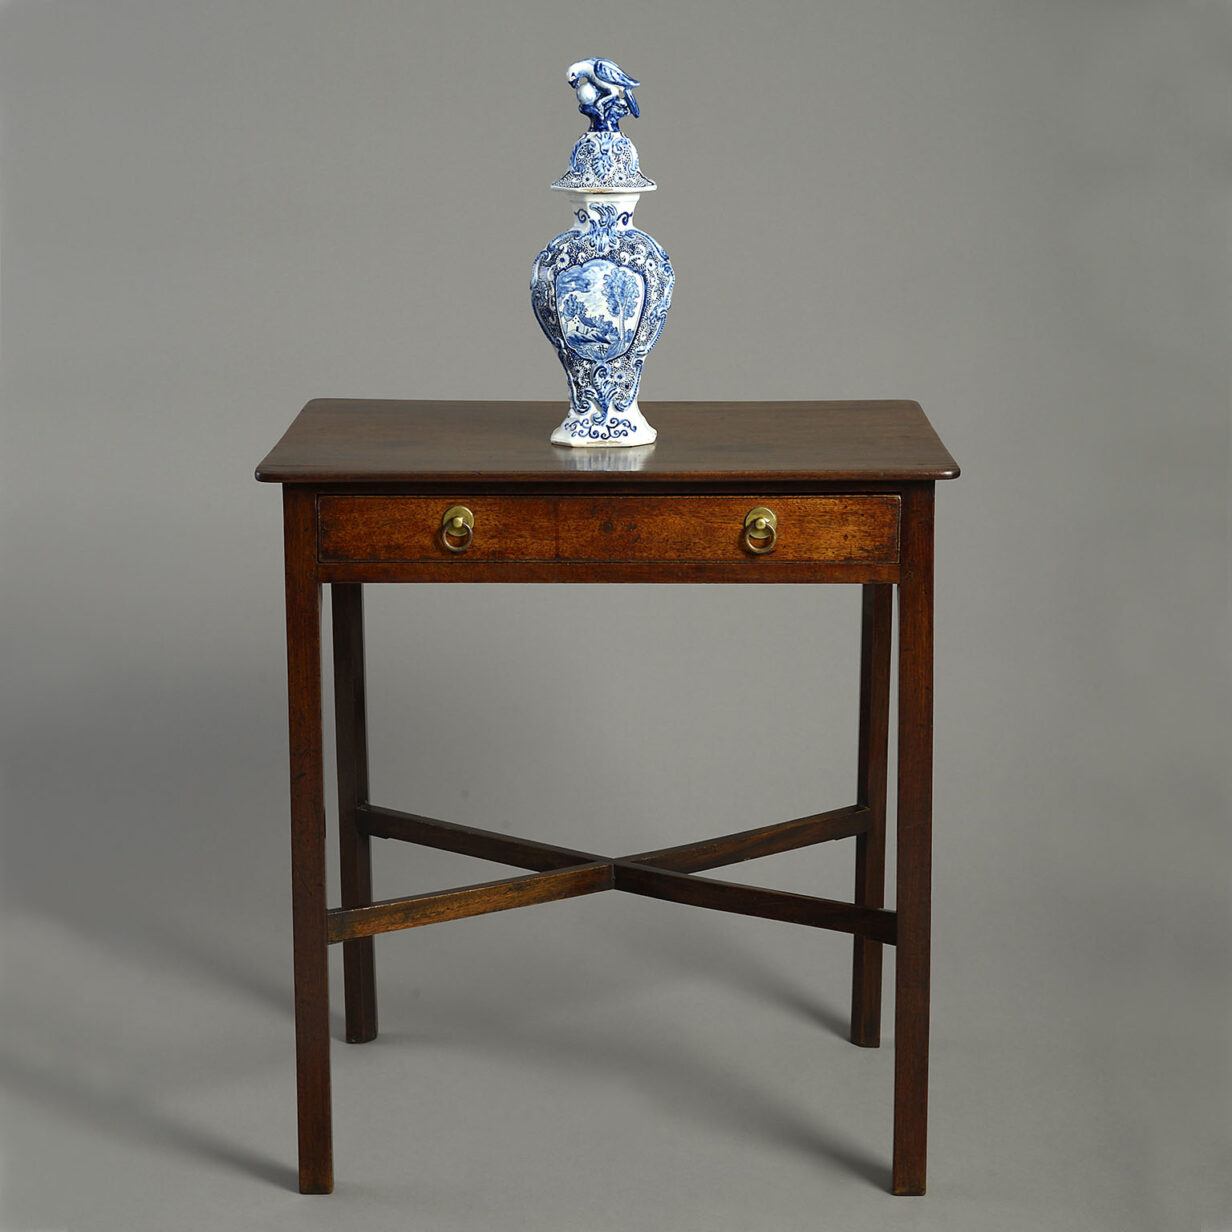 George II Period Side Table